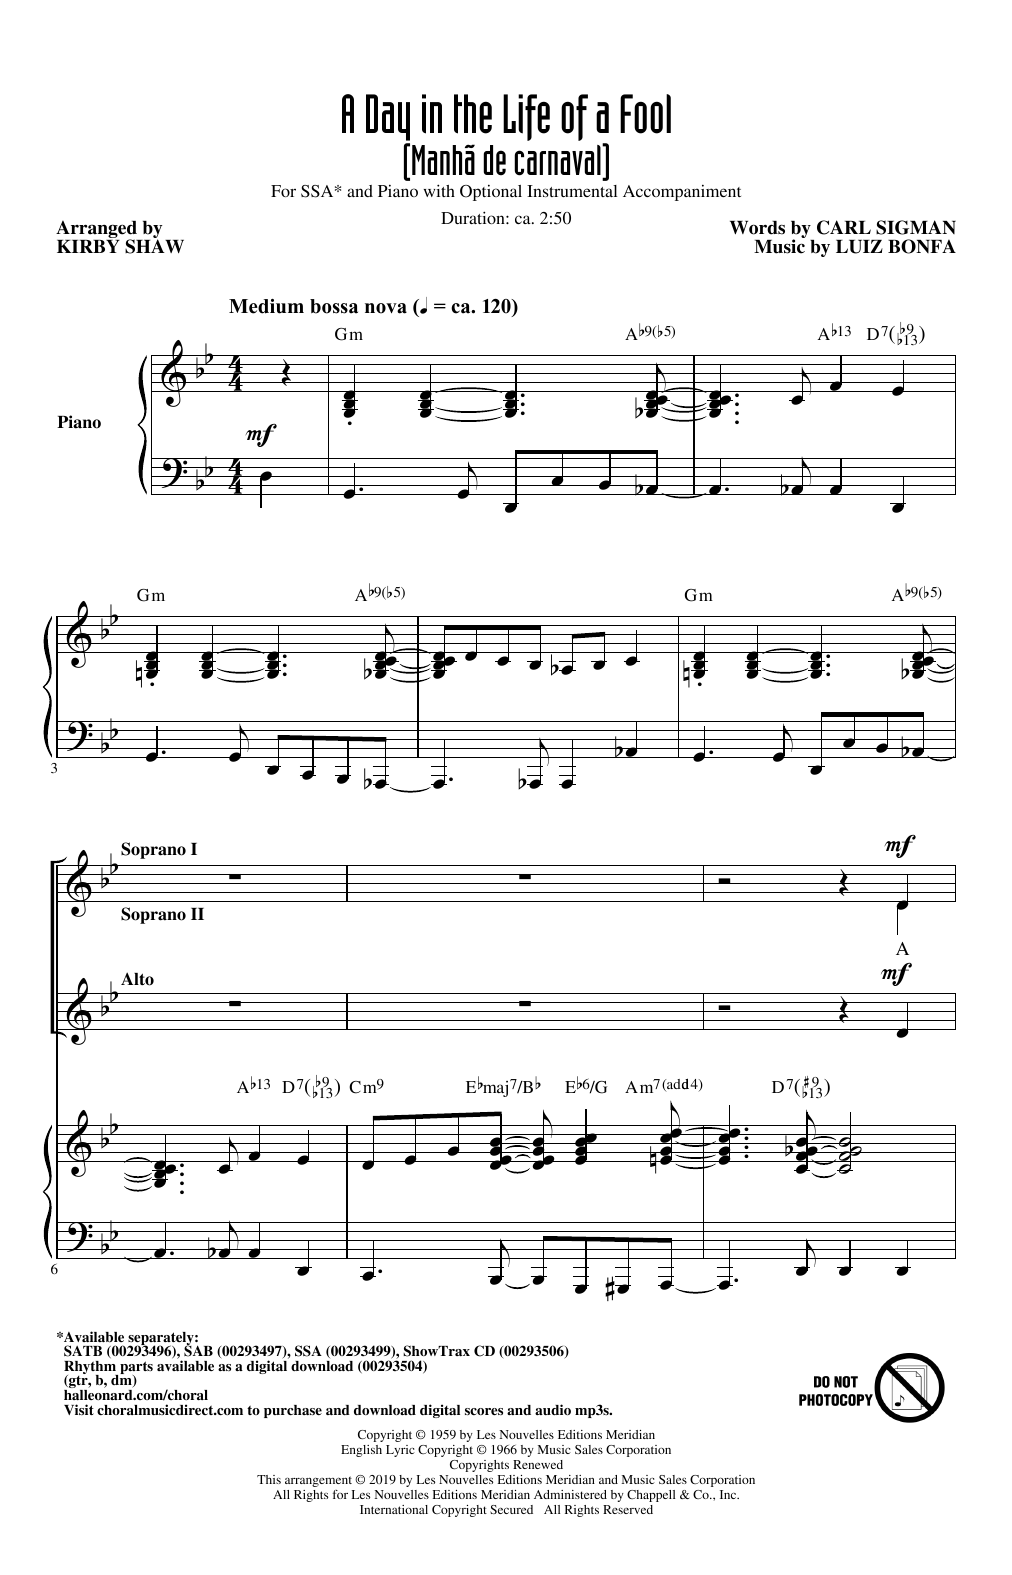 A Day In The Life Of A Fool (Manha De Carnaval) (arr. Kirby Shaw) (SSA Choir)